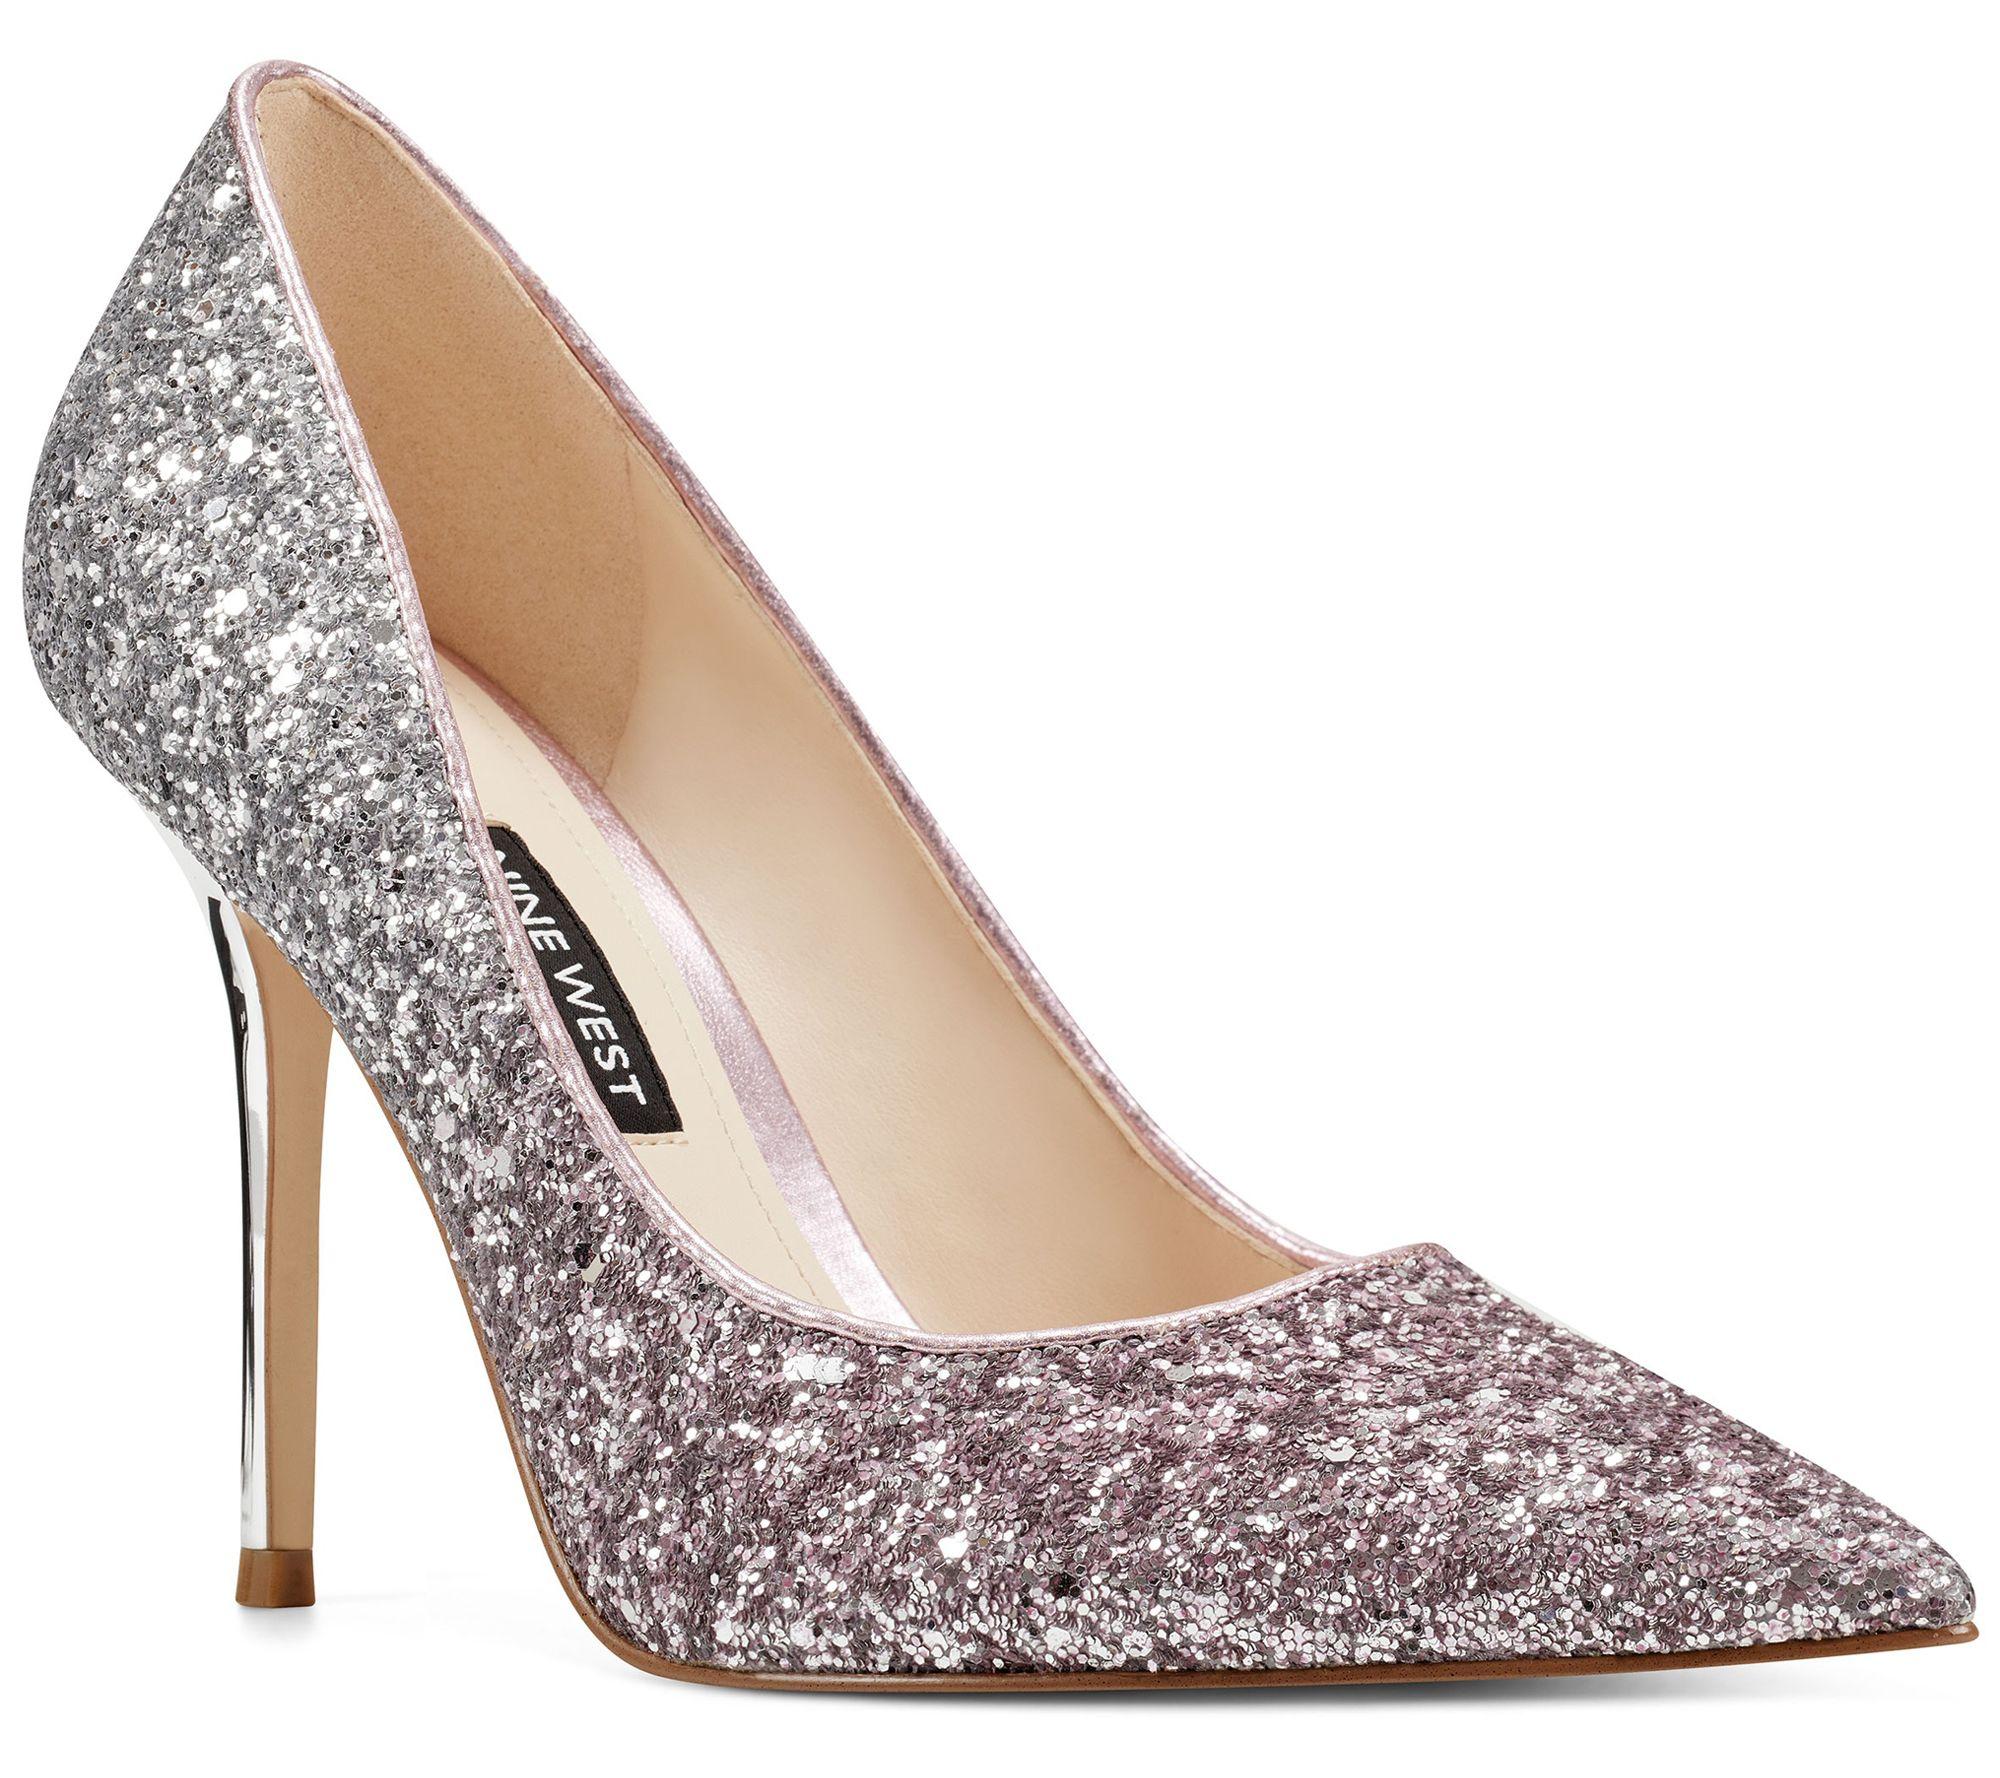 59614ec2d29 Nine West Pointed-Toe Glitter Pumps - Bliss — QVC.com